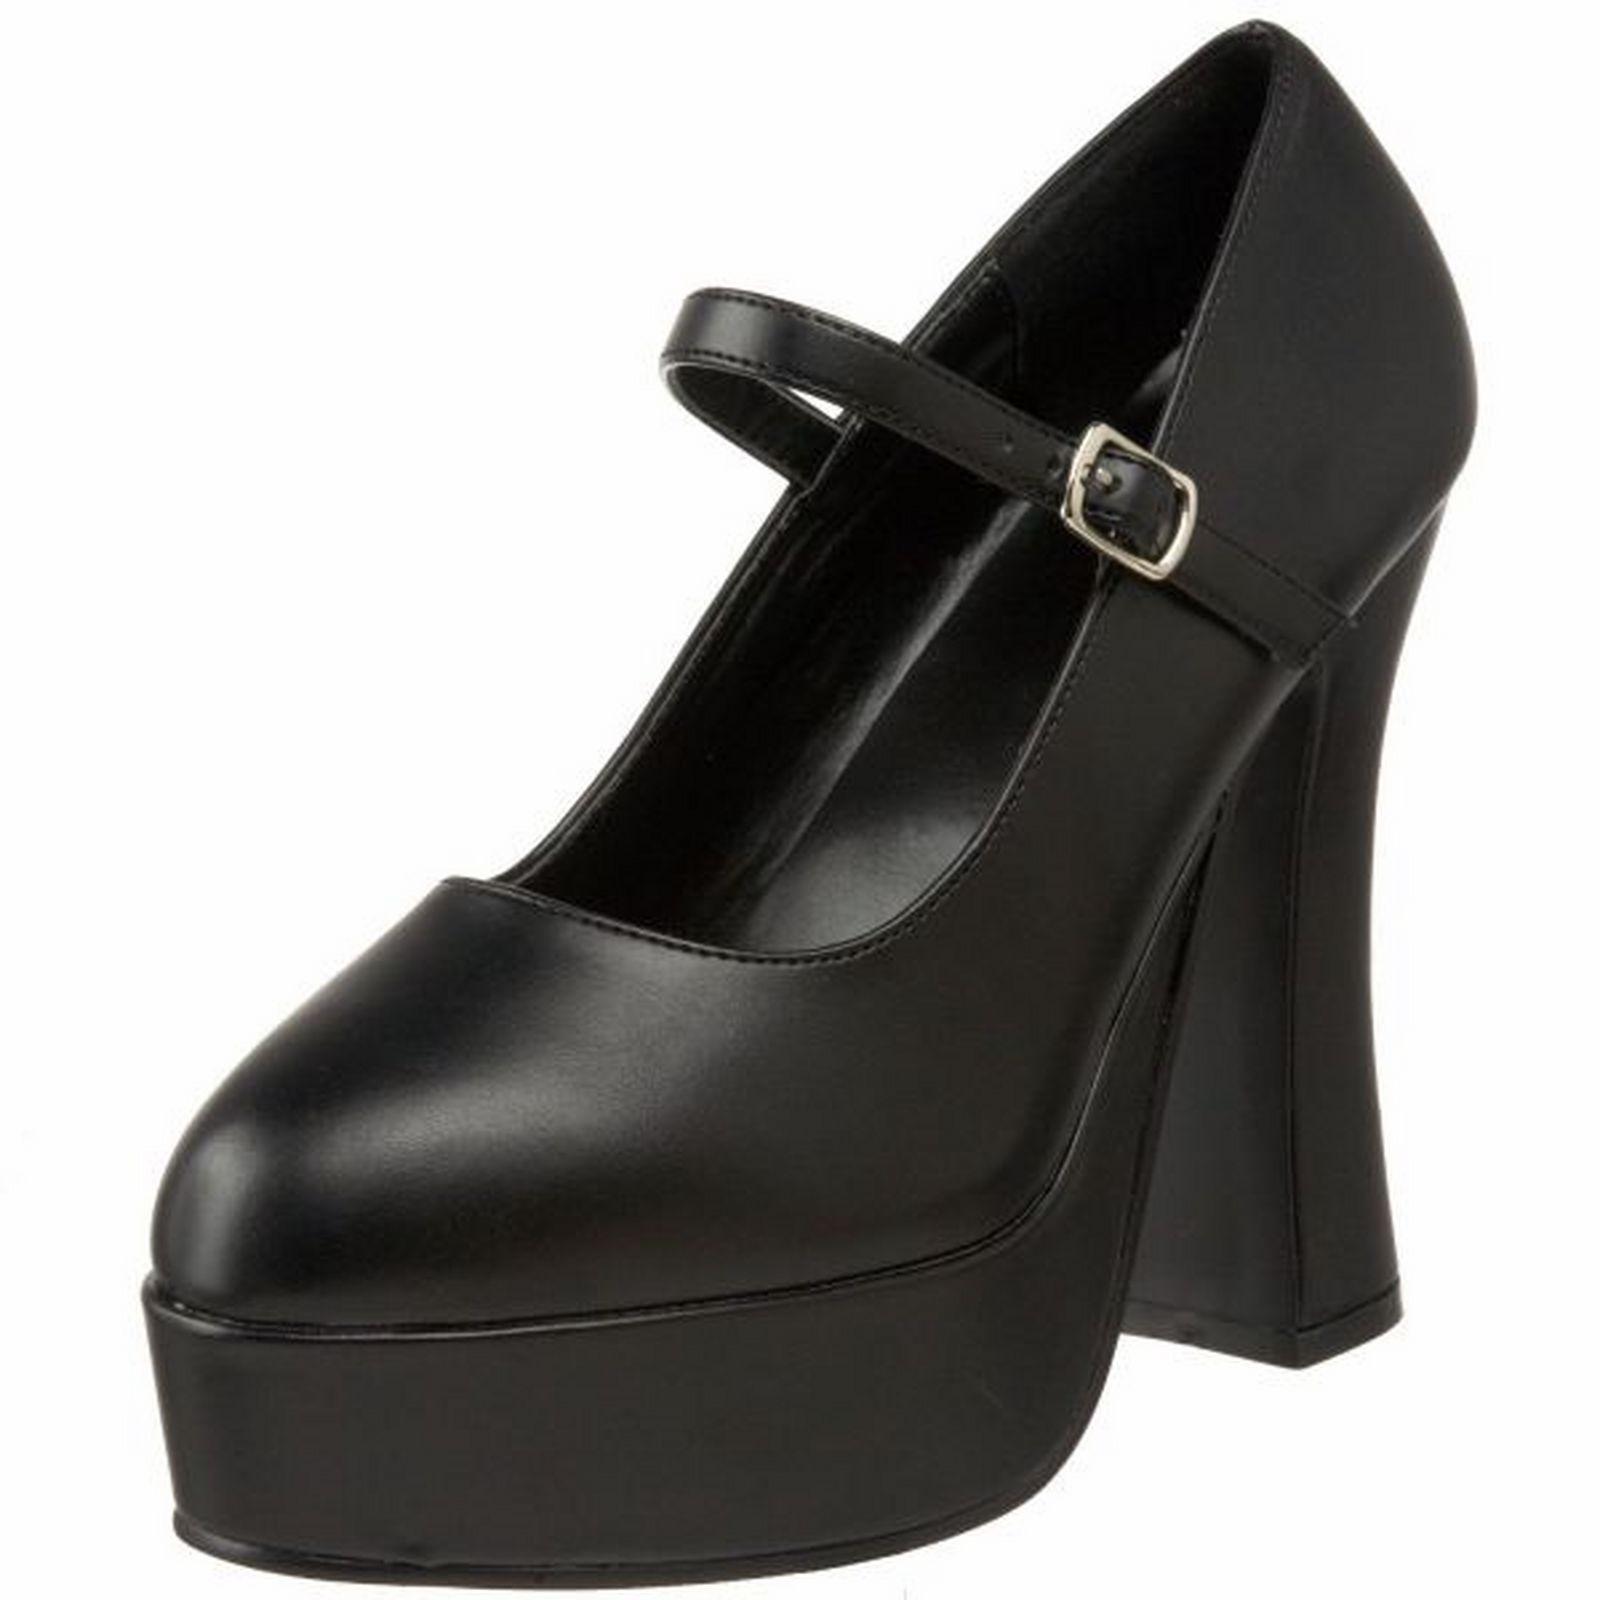 Demonia DOLLY-50 Platform Sandals Black